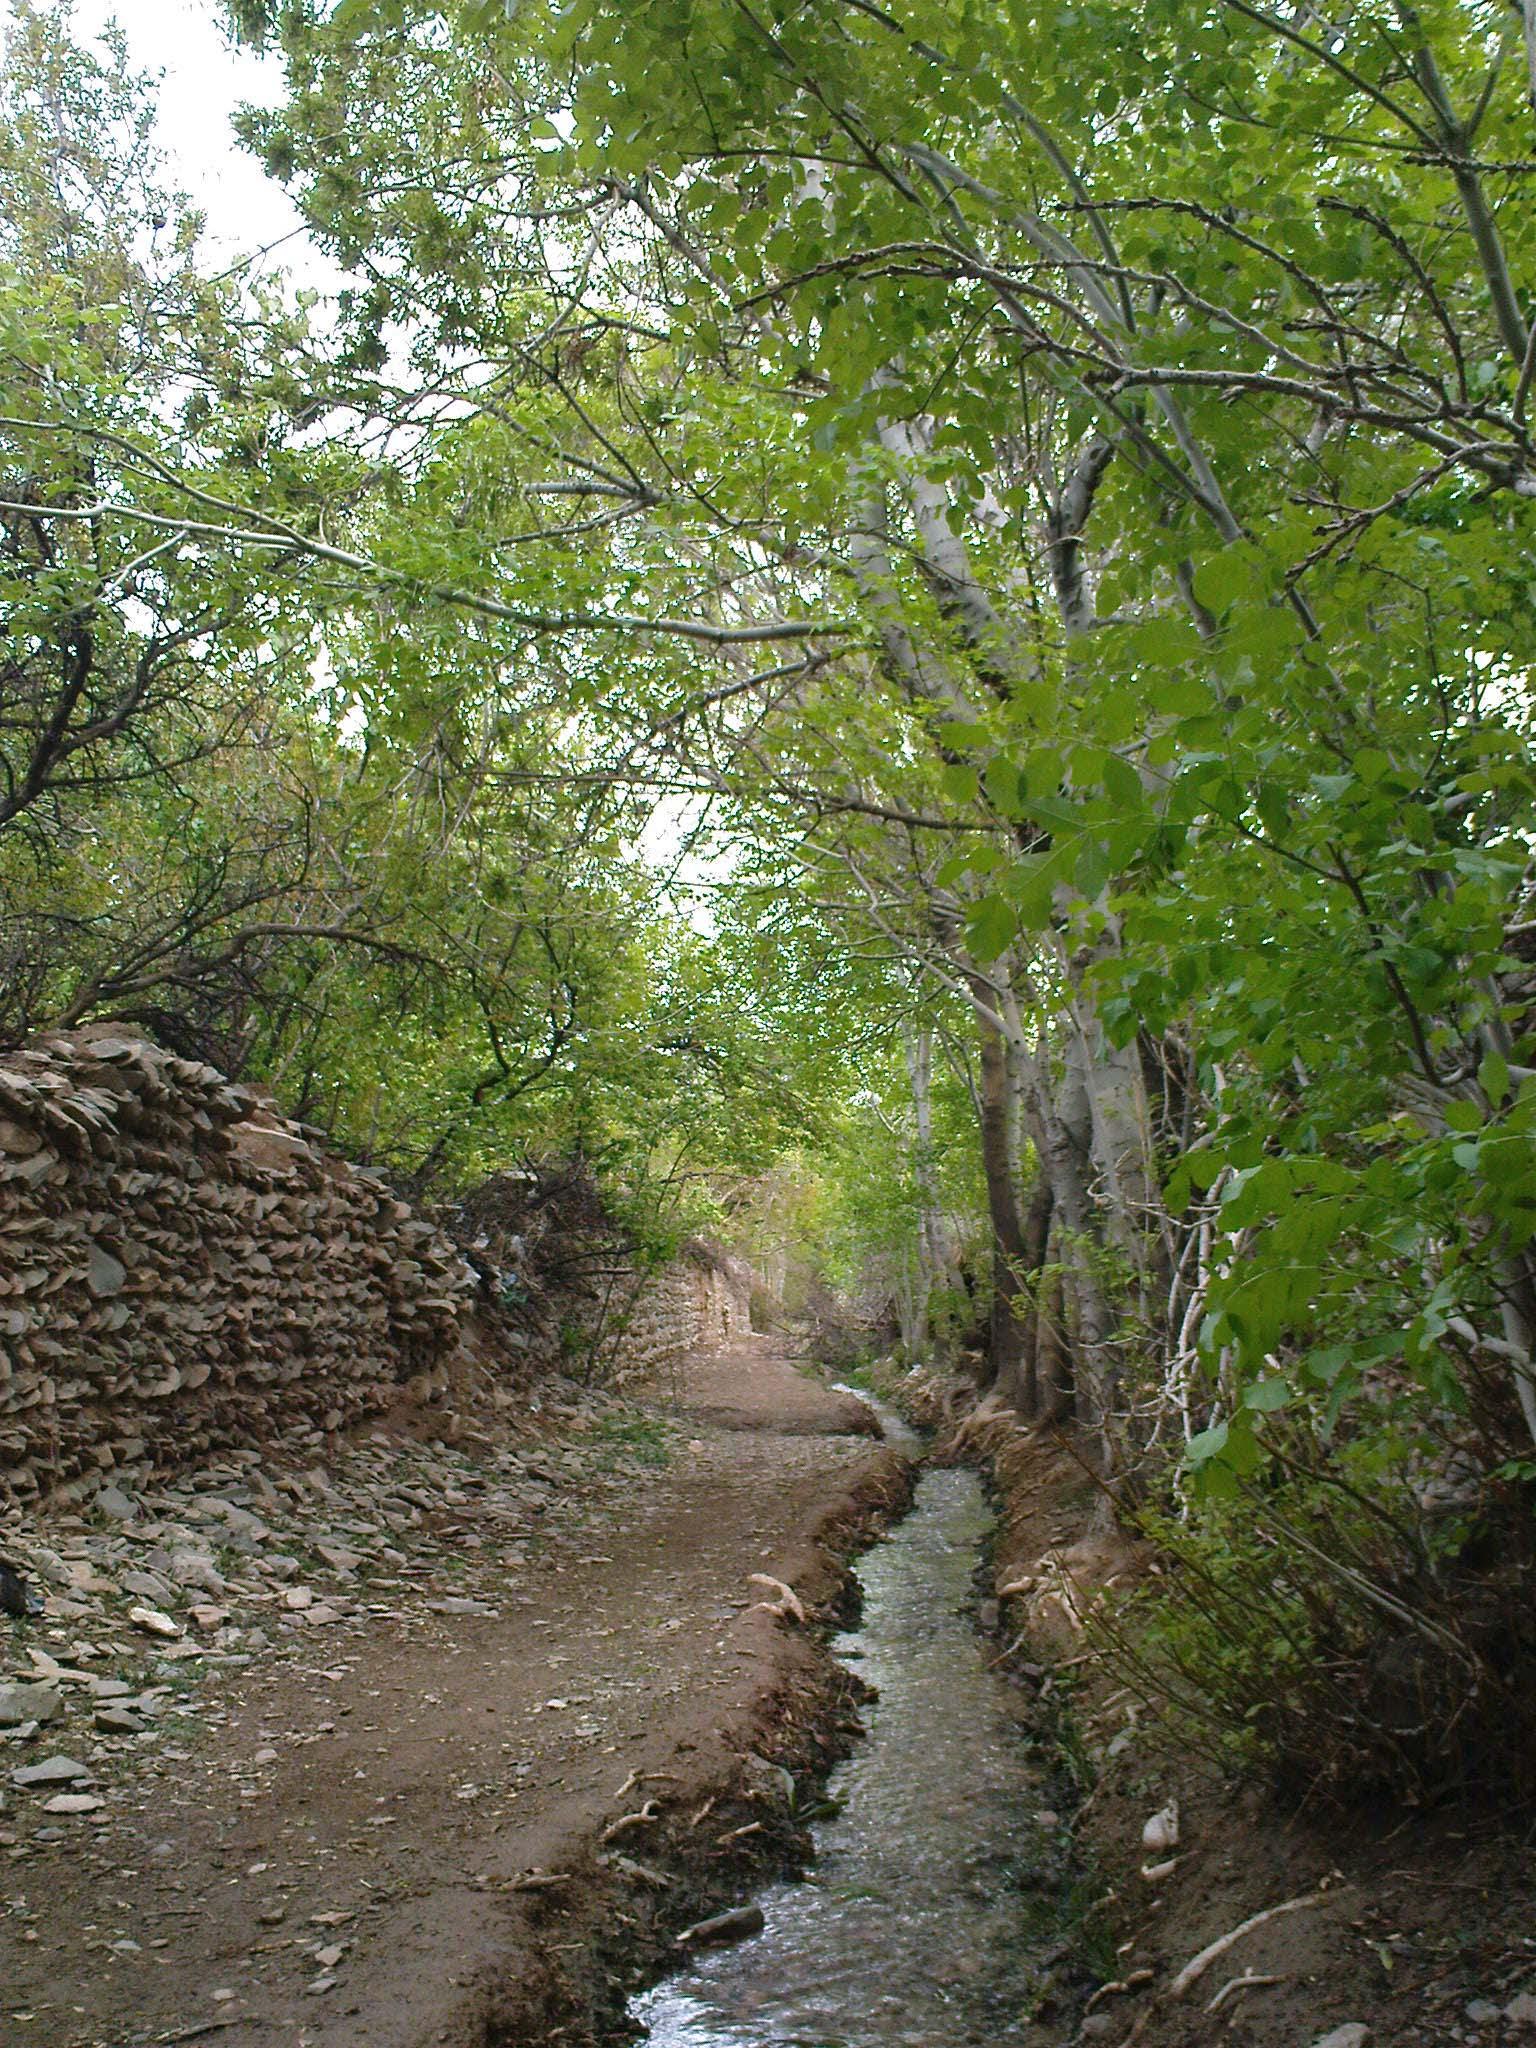 http://zibacardpostal.persiangig.com/image/DSC00002.jpg